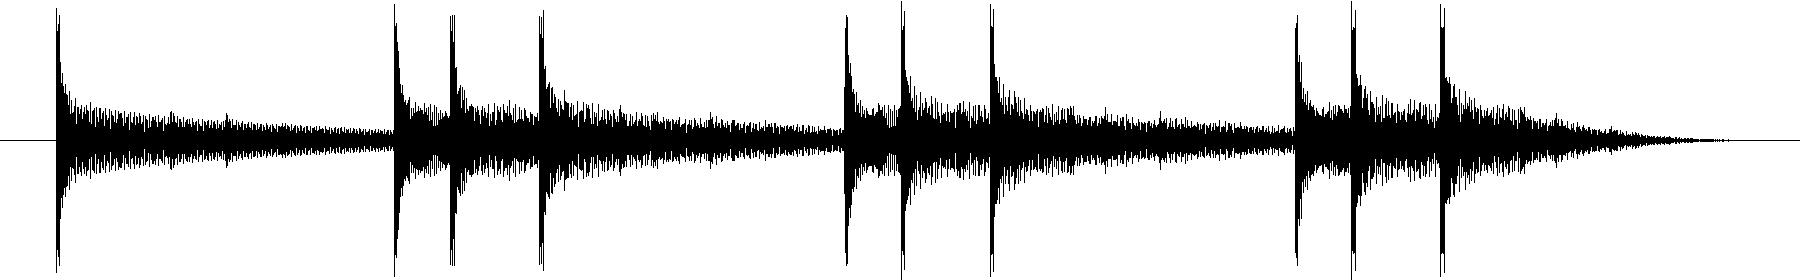 tr08 ch 123 inthewind f minor